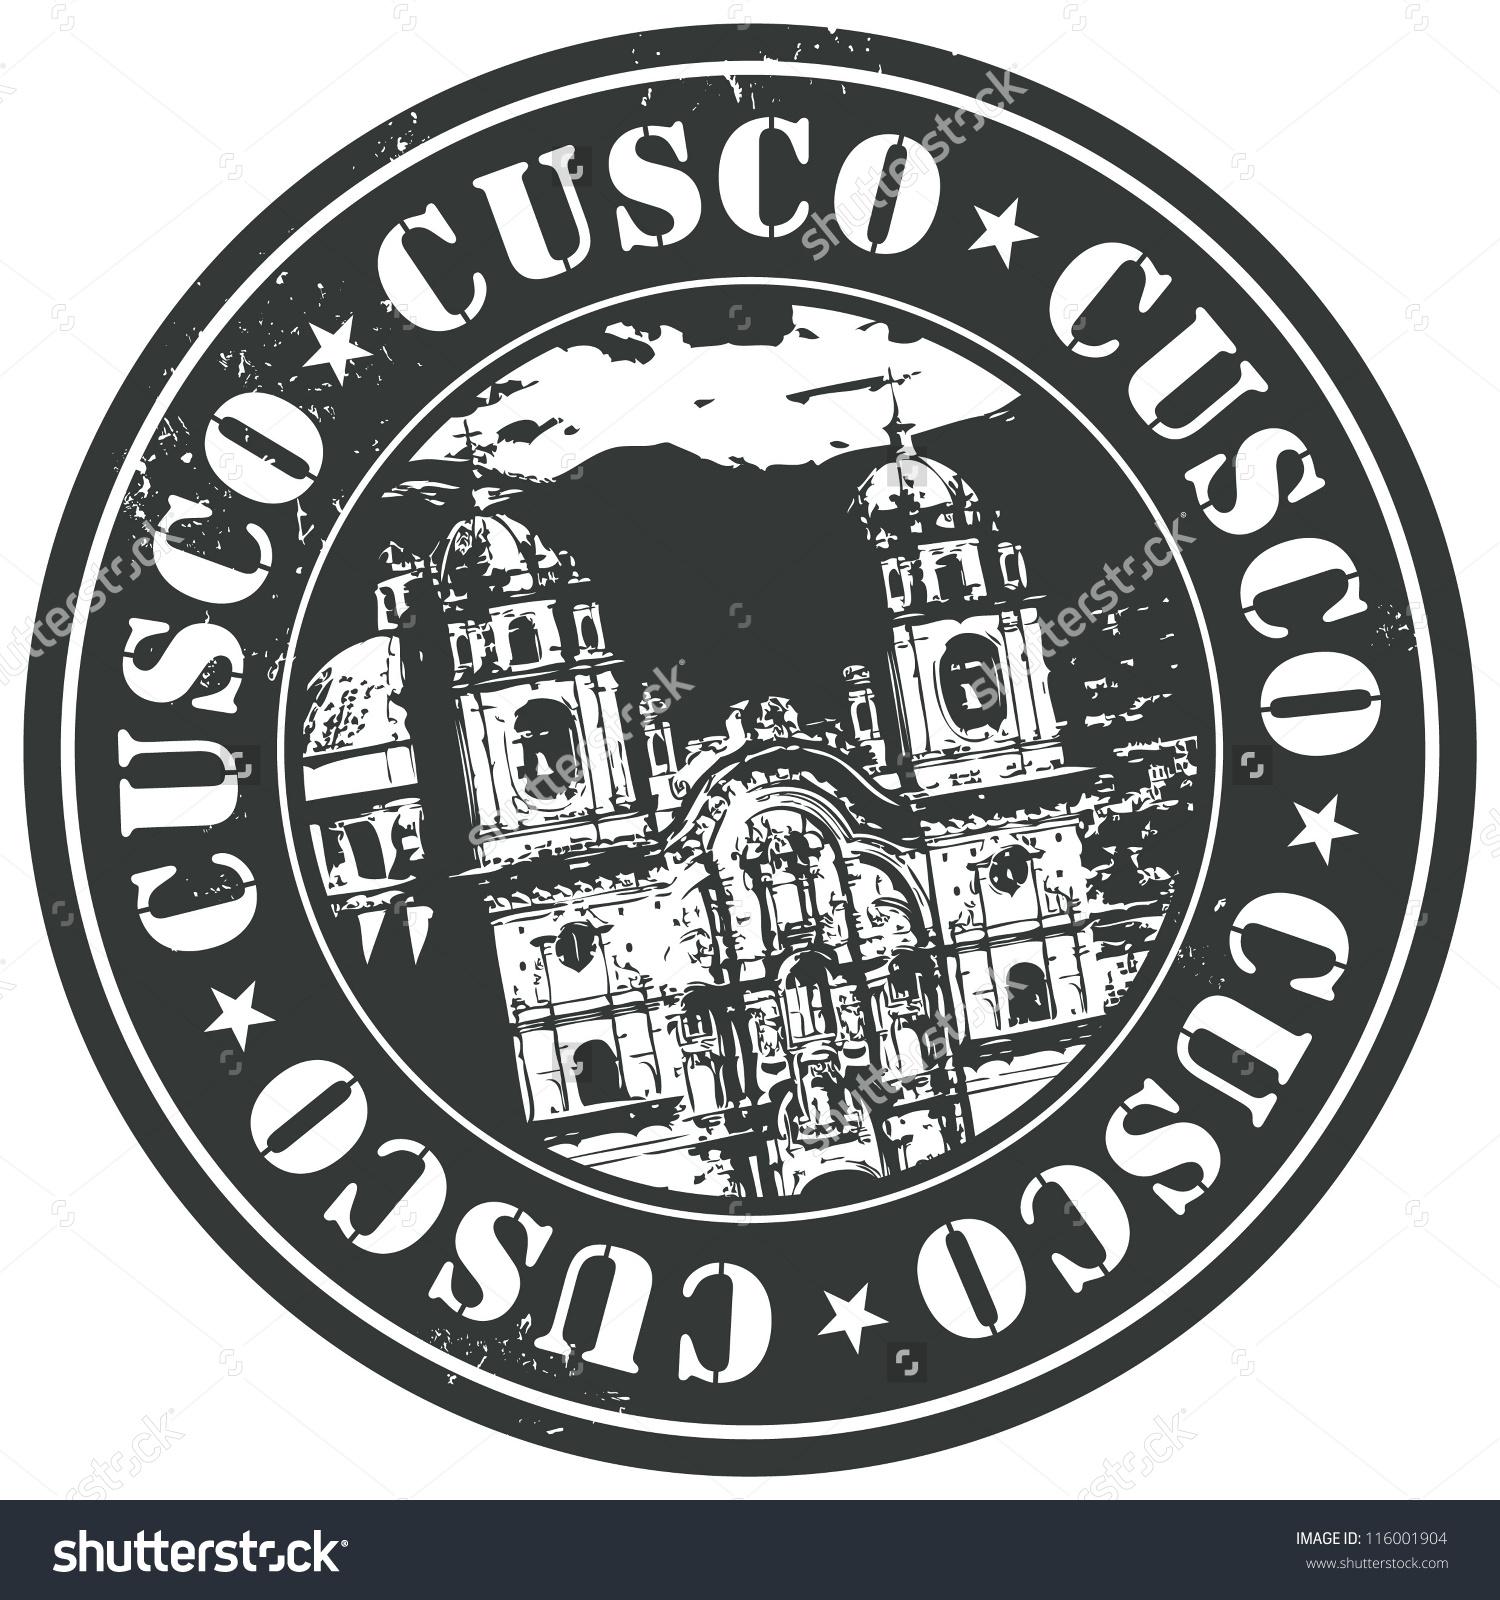 Cusco Stamp Stock Vector 116001904.